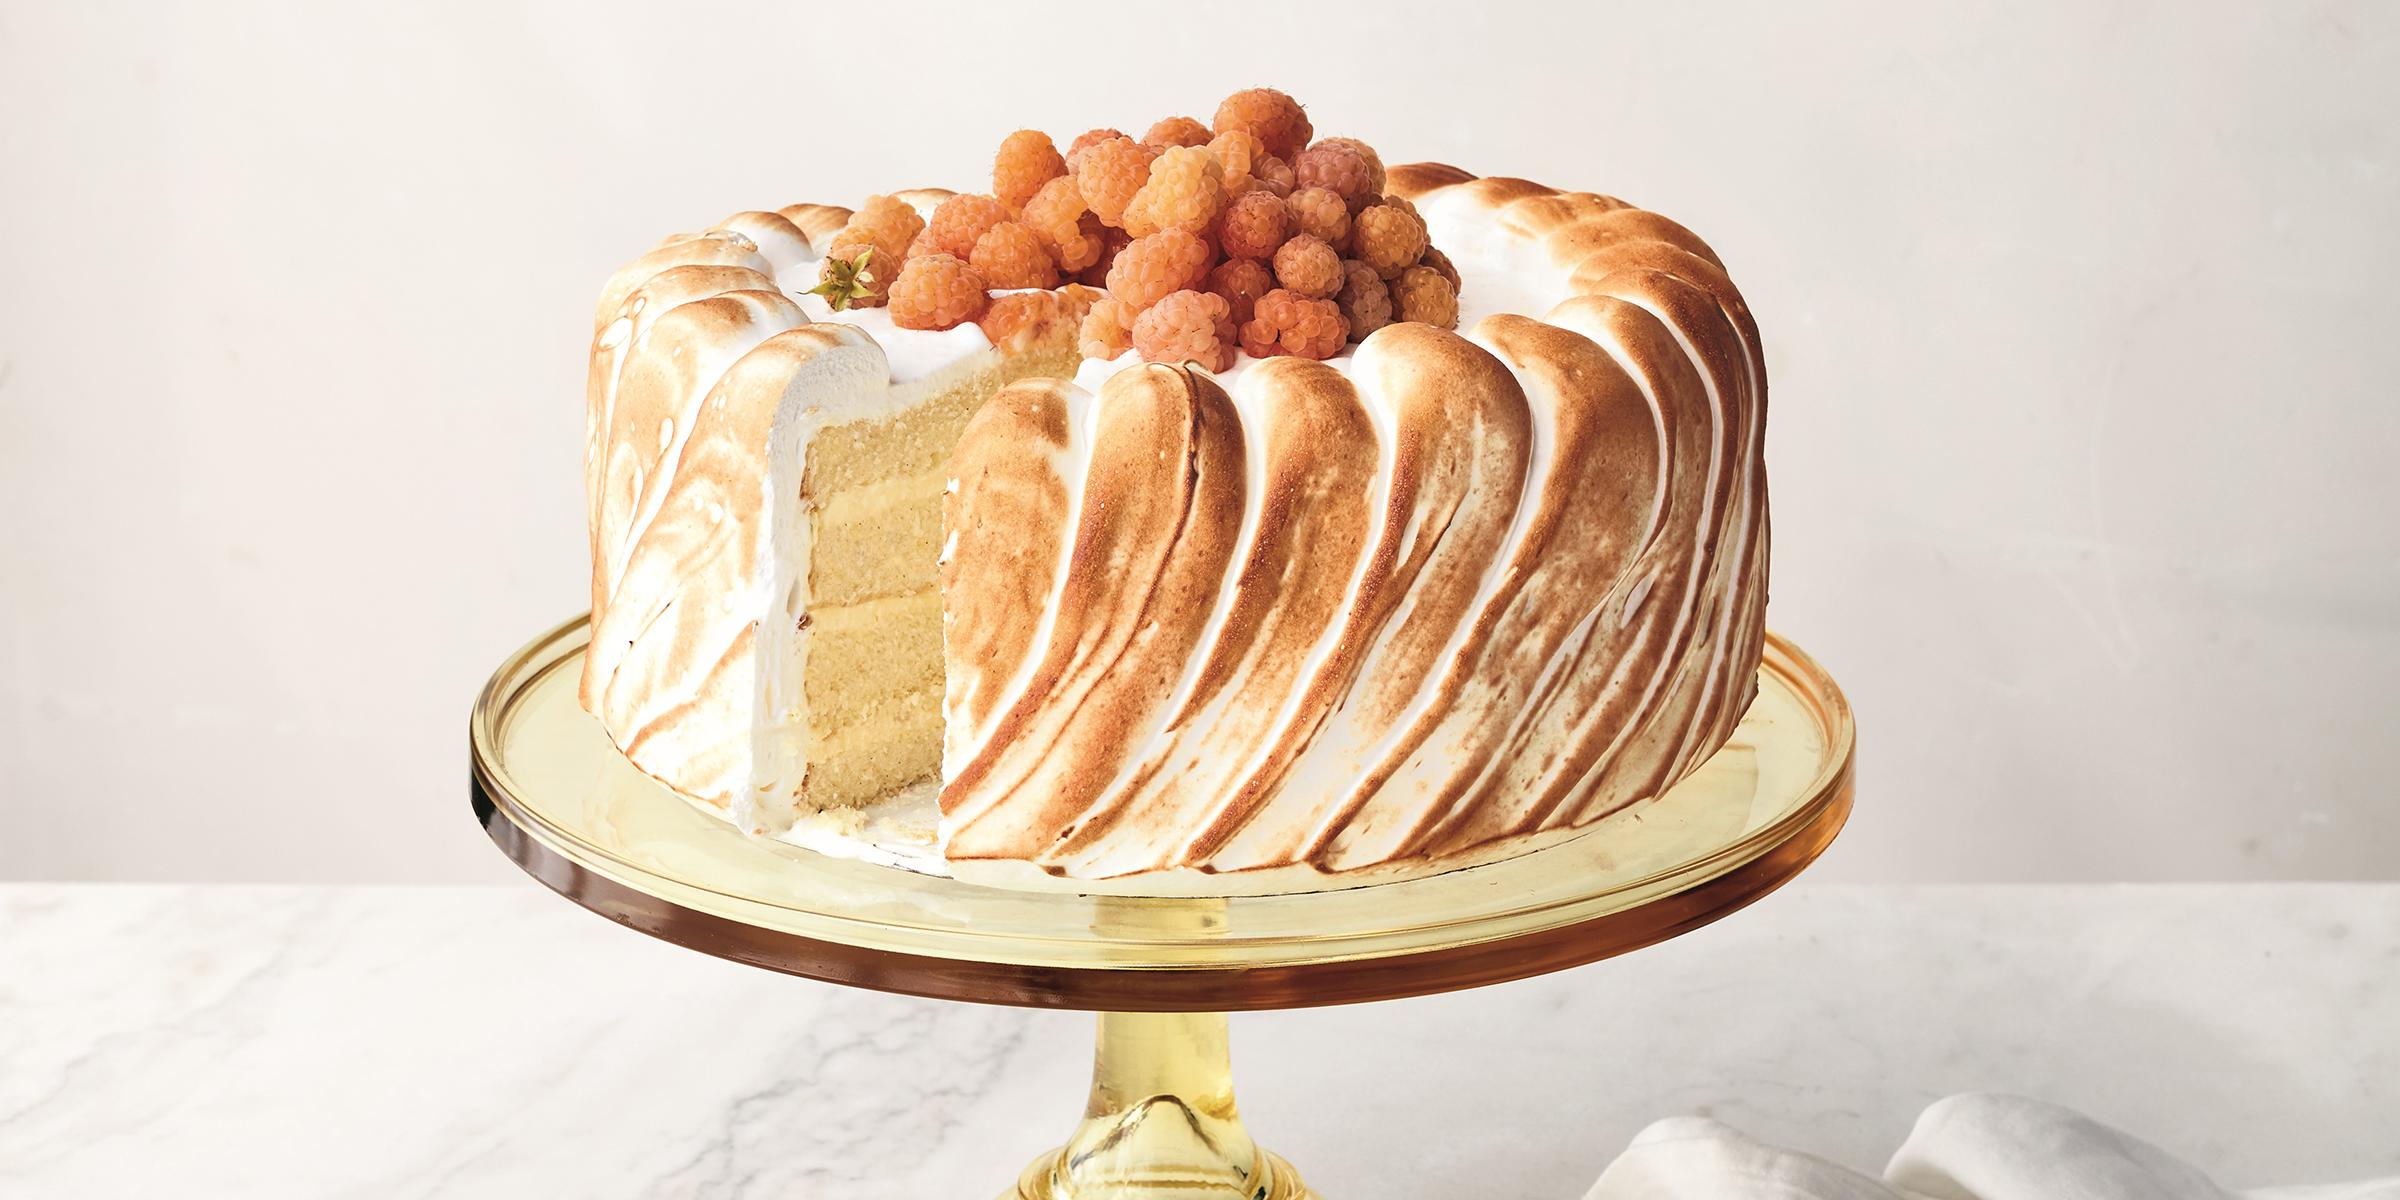 Cake, Cake, Cake, Cake, Cake, Cake, Cake & Cupcakes - cover